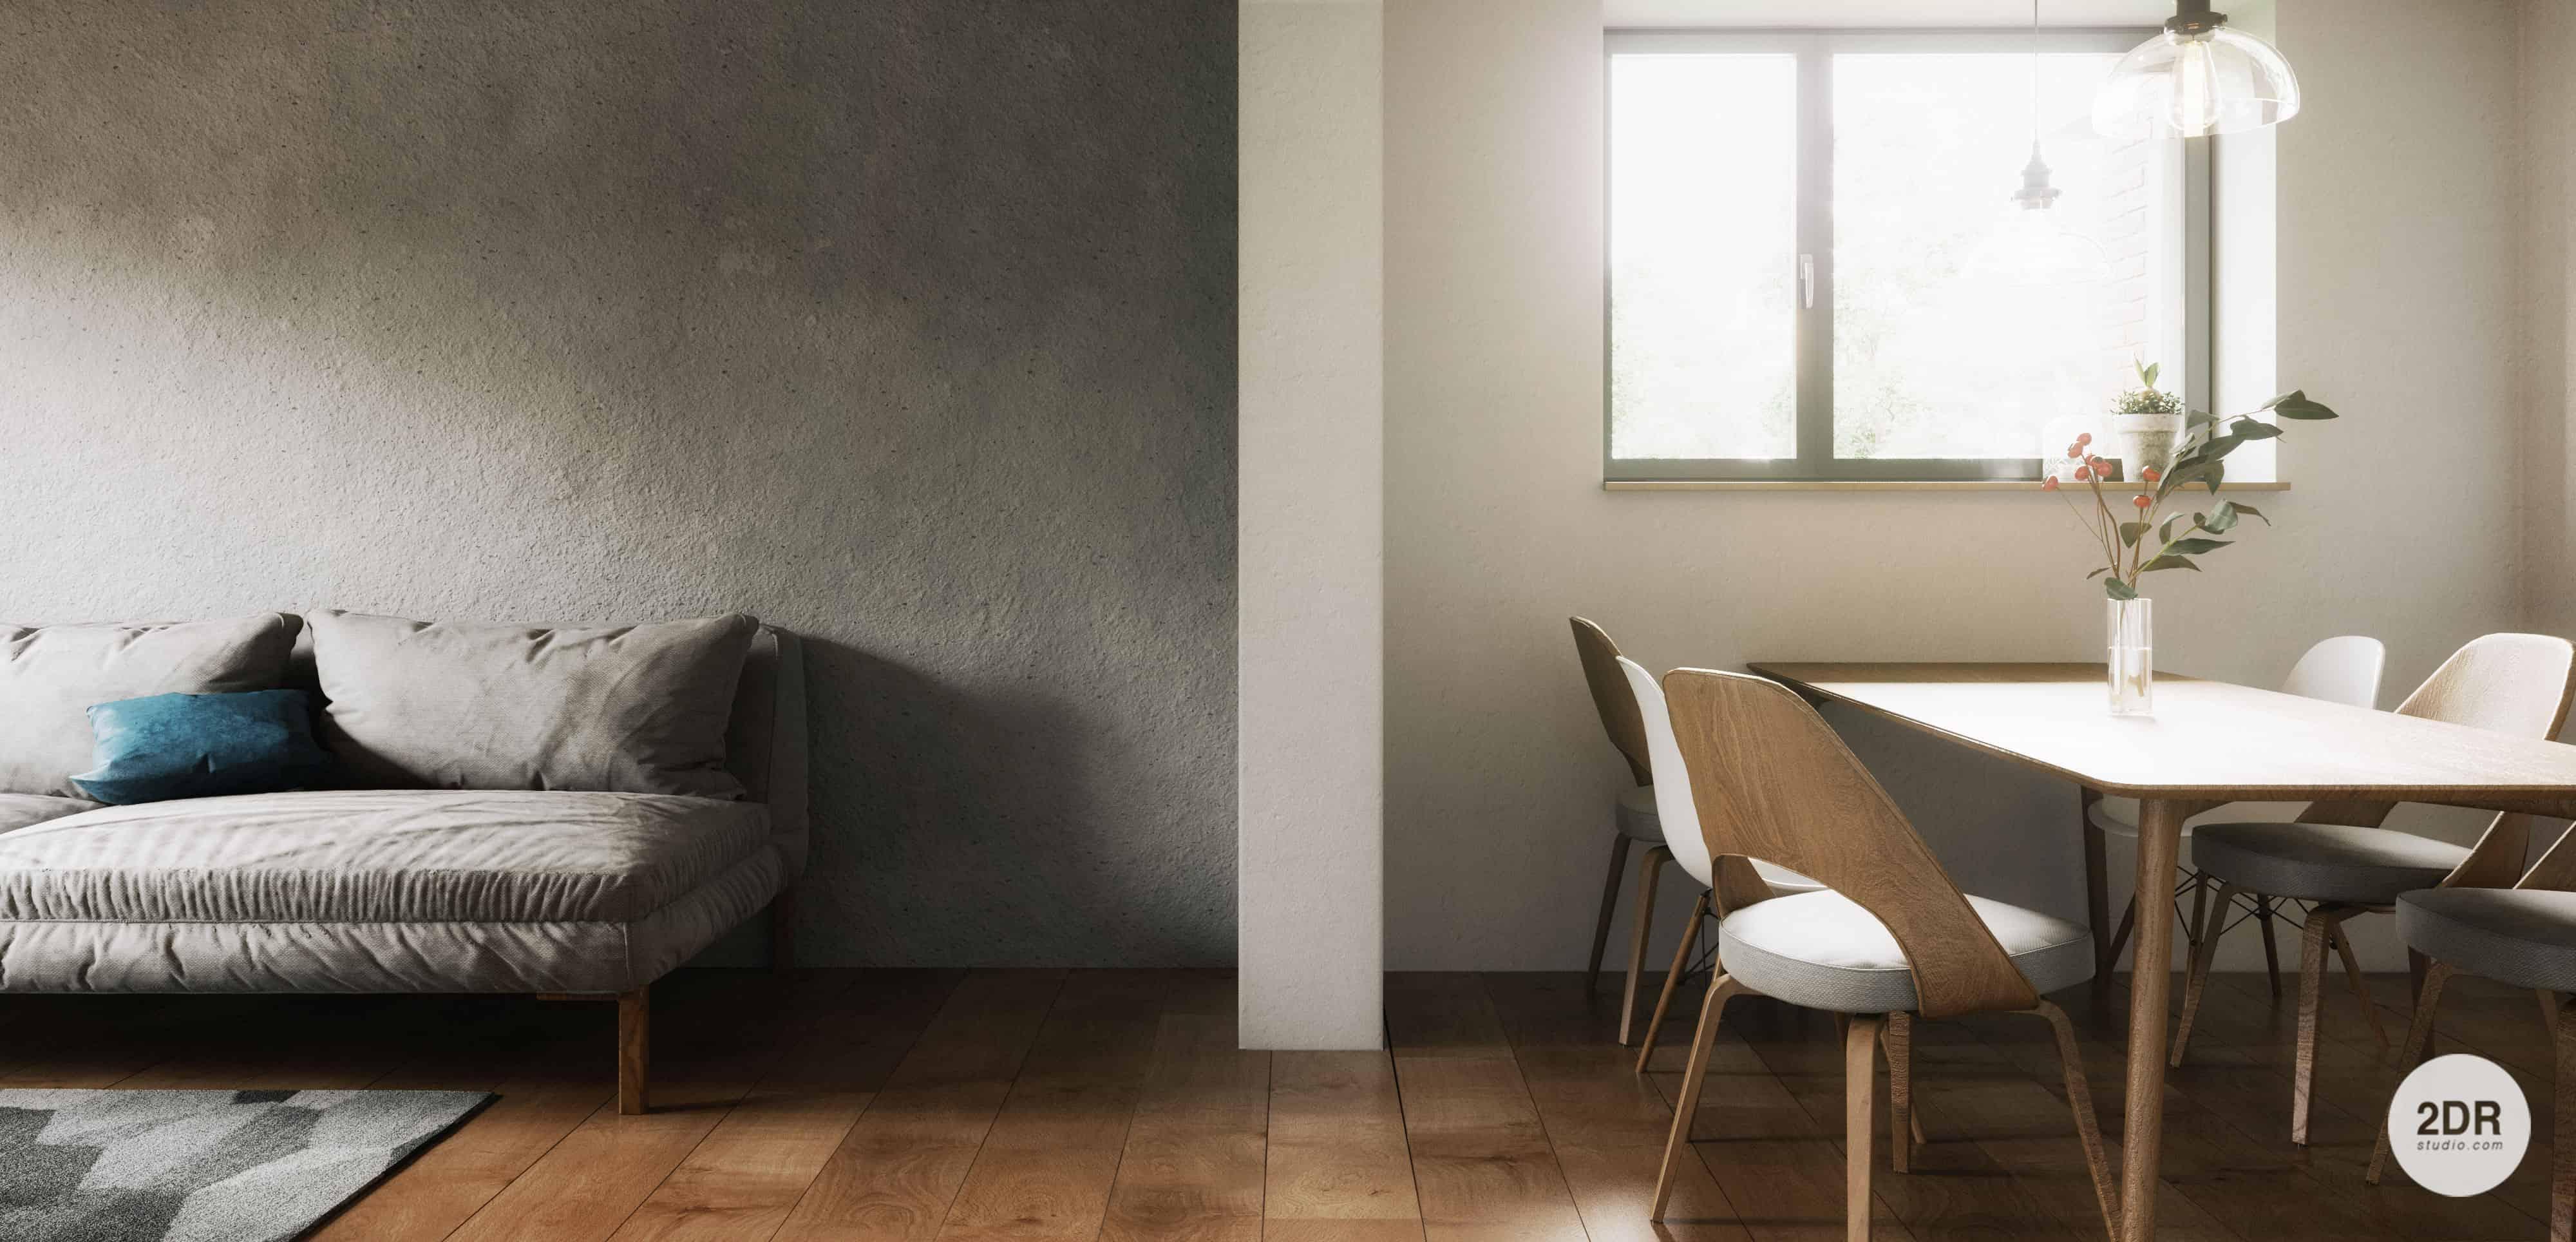 detail-obyvaci-pokoj-bytove-domy-budova-interier-plzen-architektonicka-vizualizace2